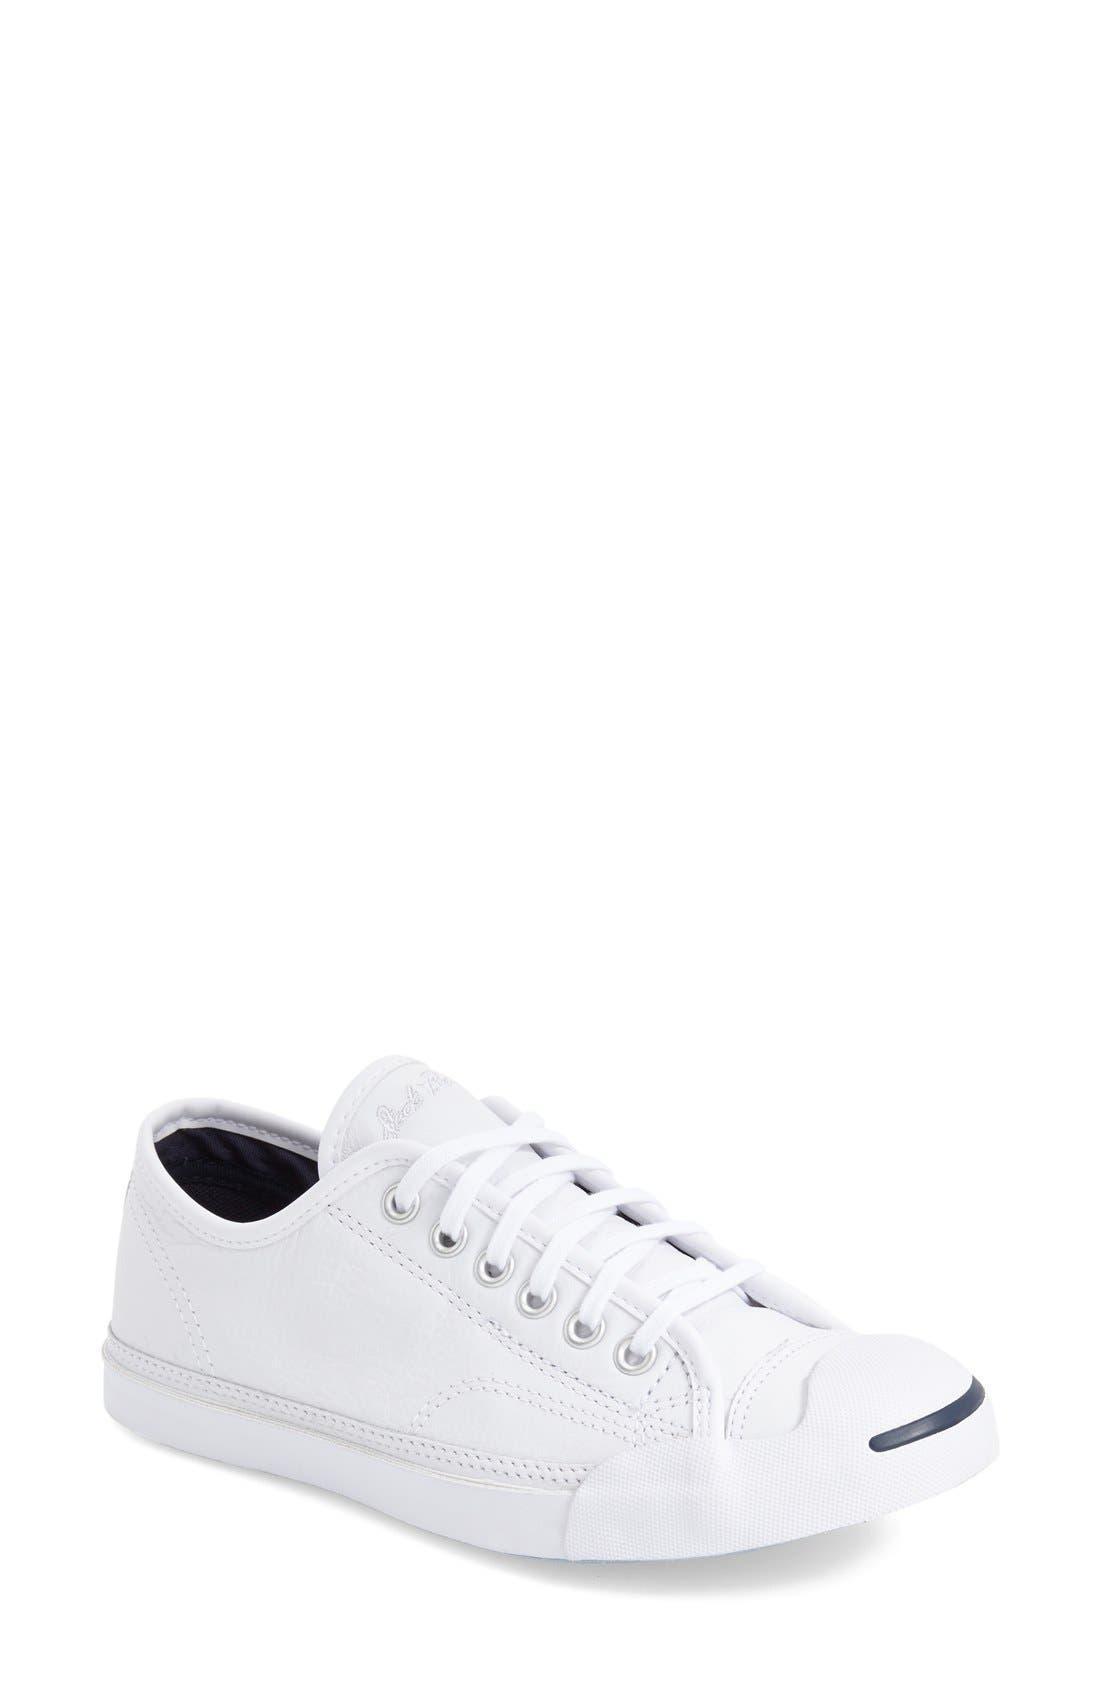 Converse 'Jack Purcell' Low Top Sneaker (Women)